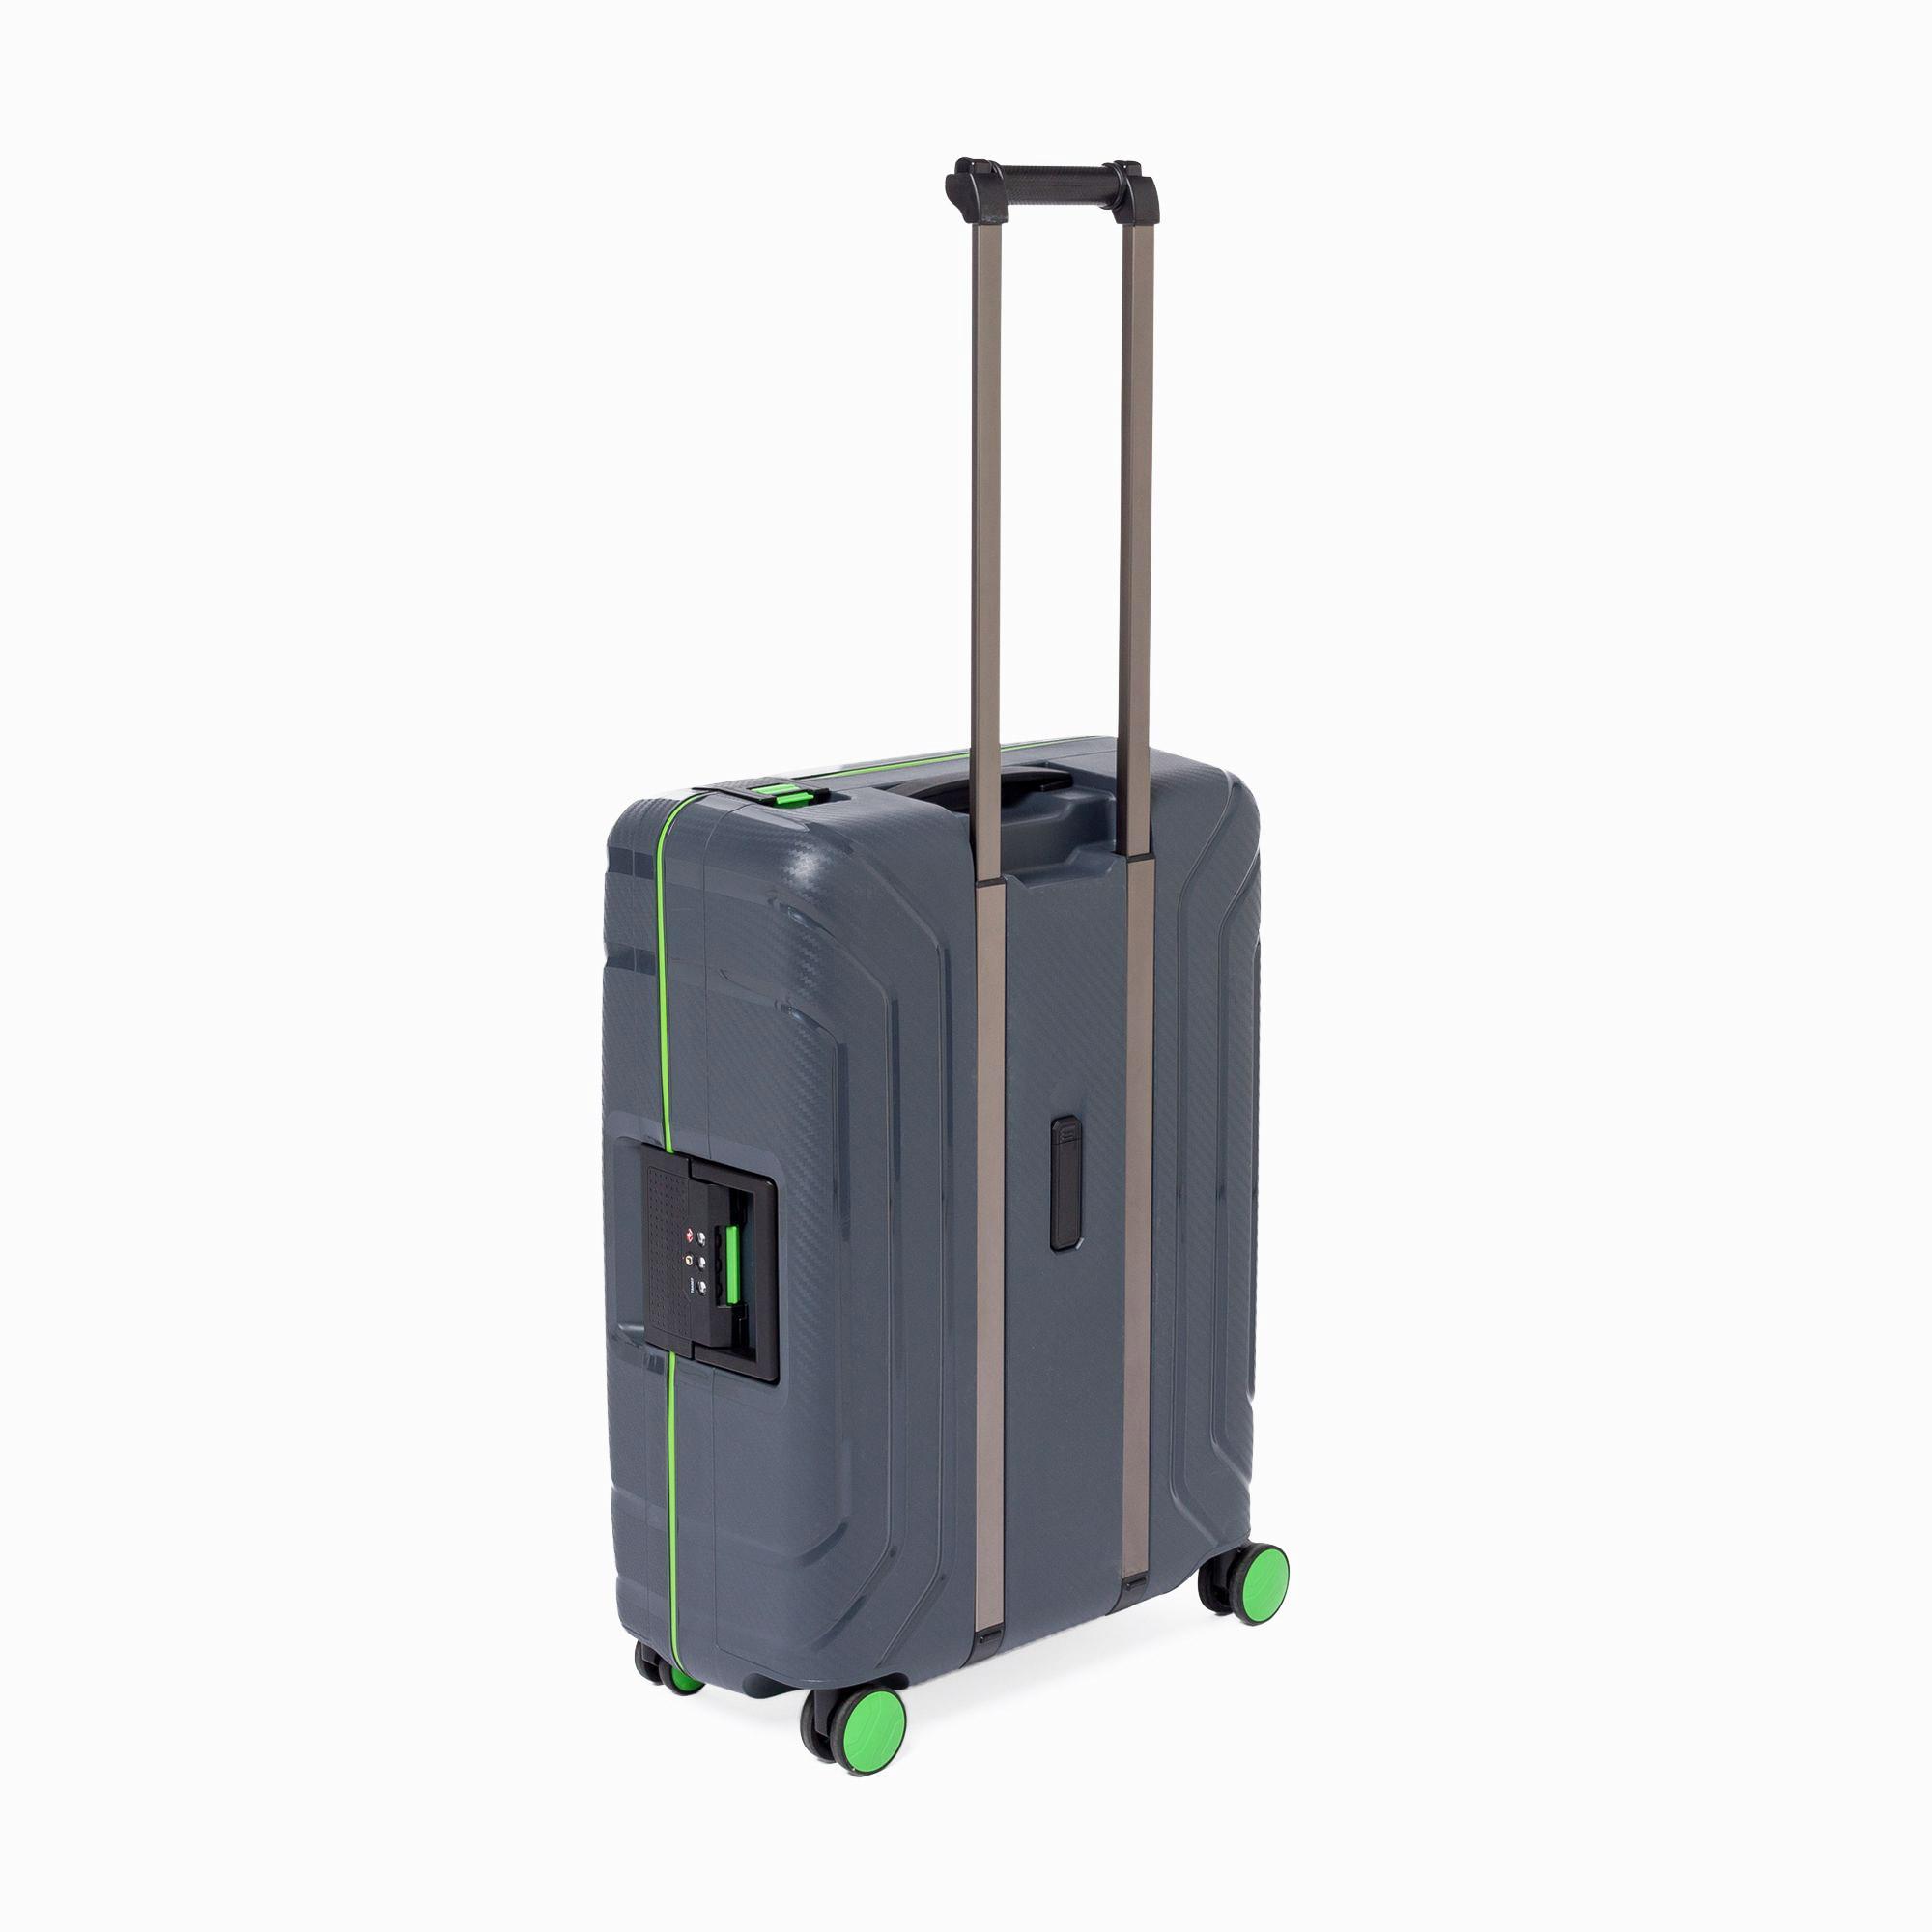 Mittelgrosse Koffer  ANTHRAZIT Modo by Roncato